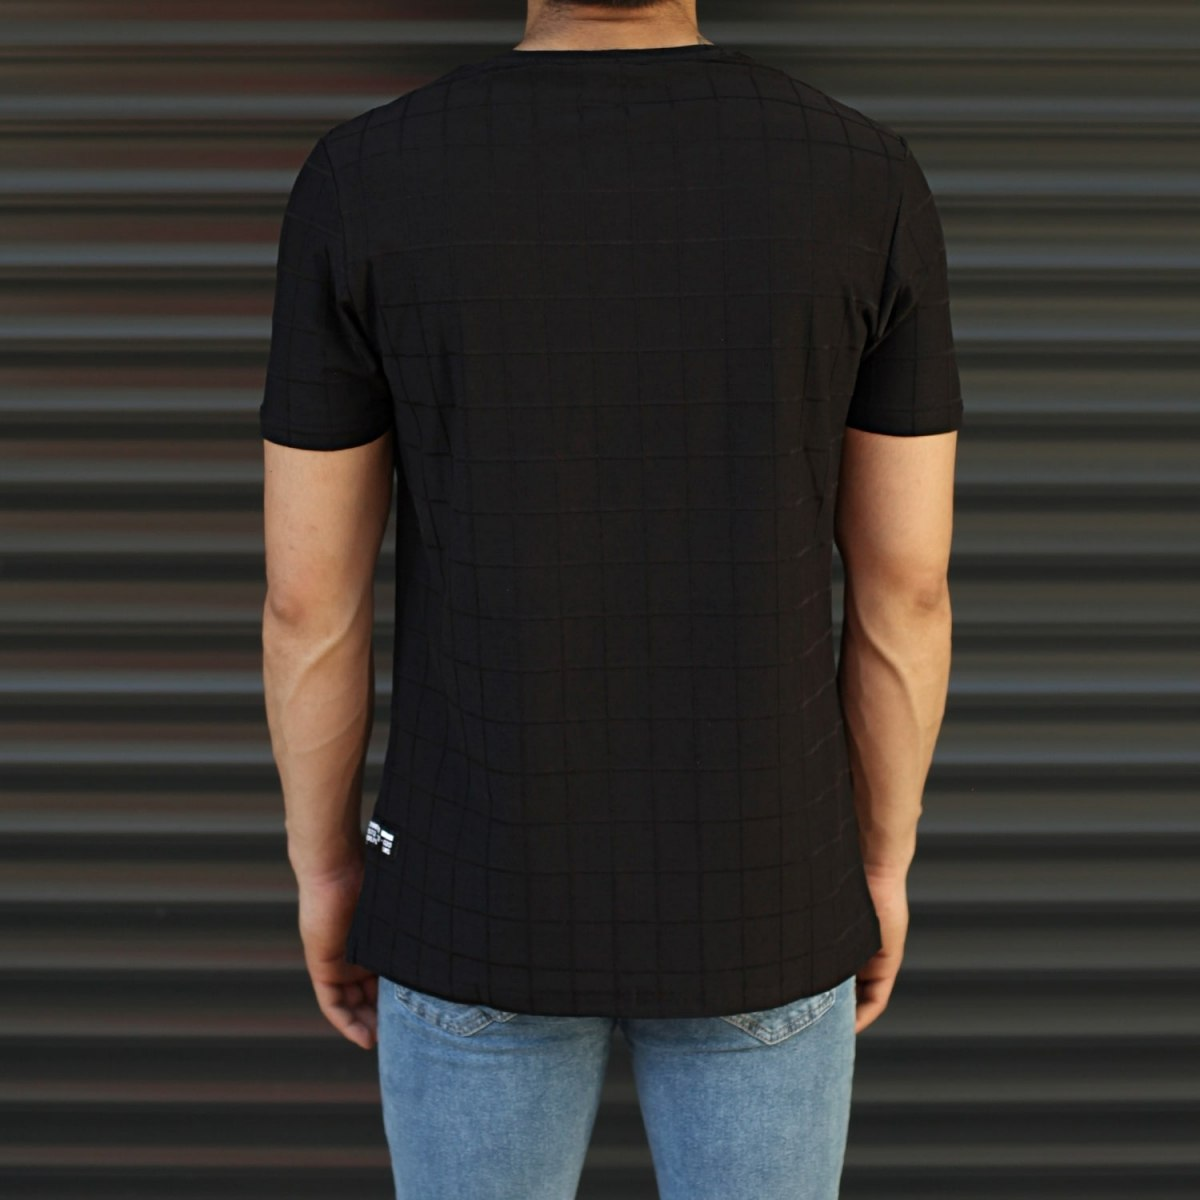 Men's Longline Muscle Fit T-Shirt In Black Mv Premium Brand - 3